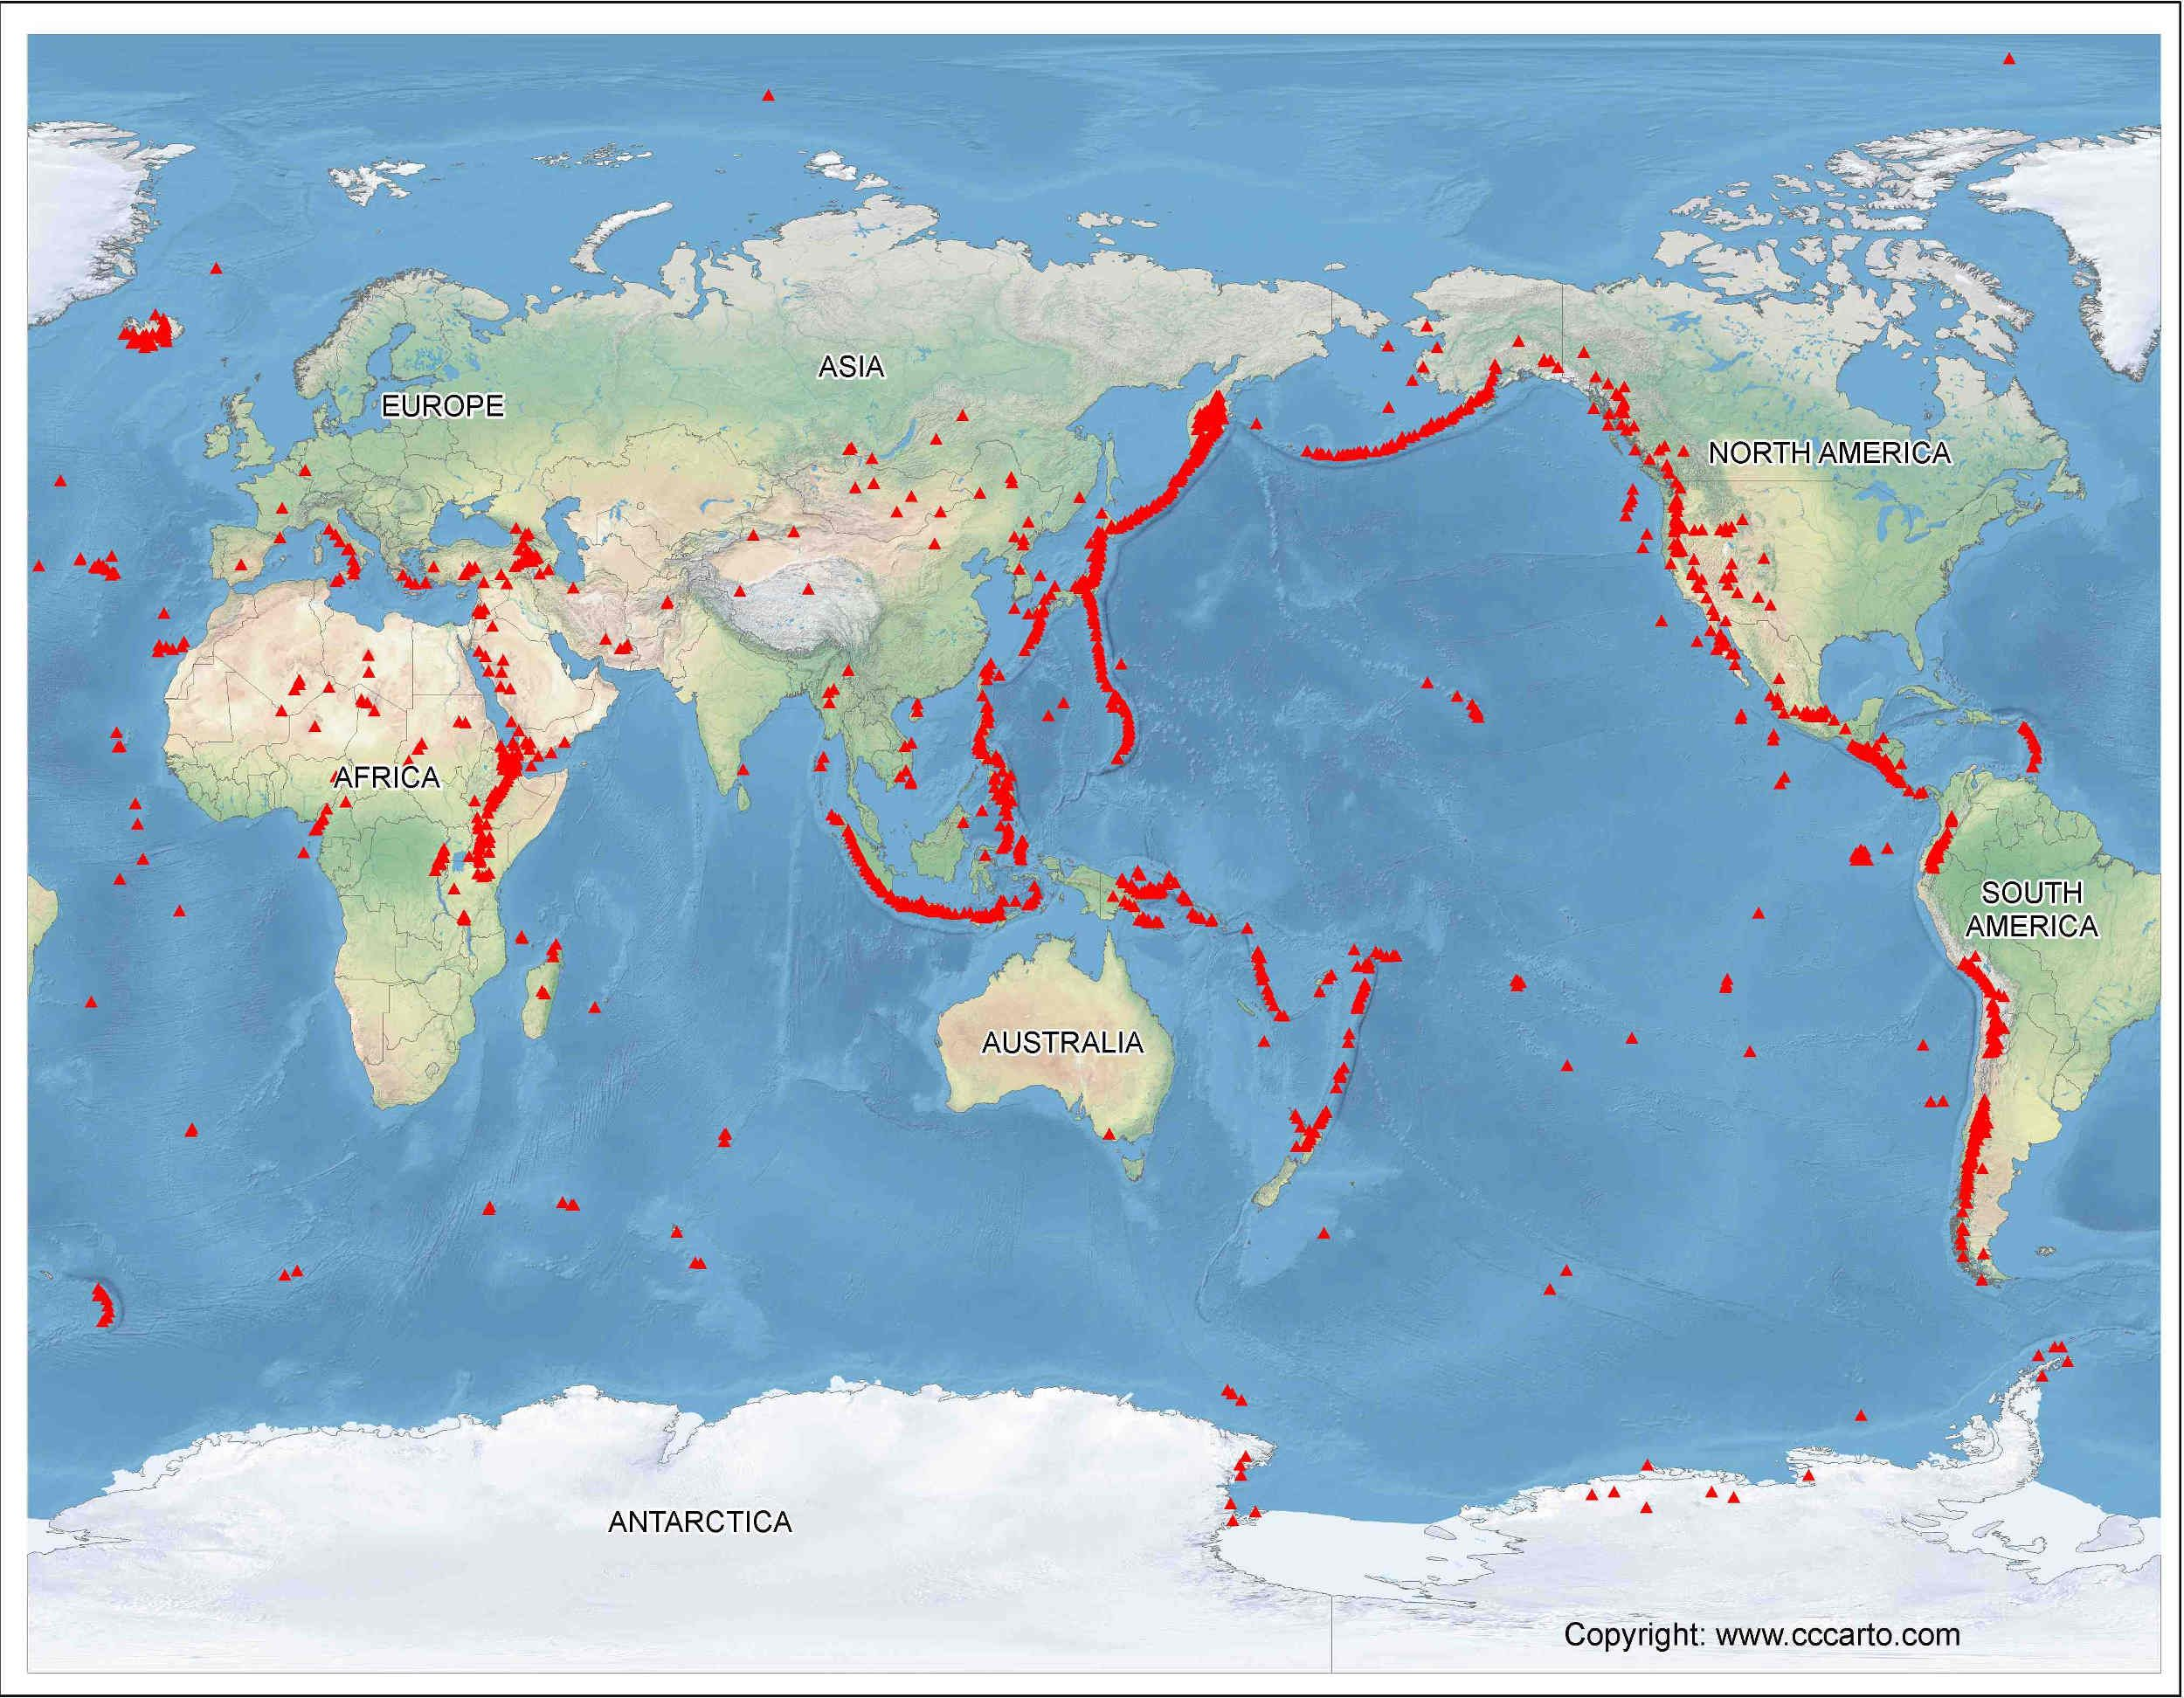 Global Vulcanism Chart Google Search Earth Pinterest - Volcanoes in usa map